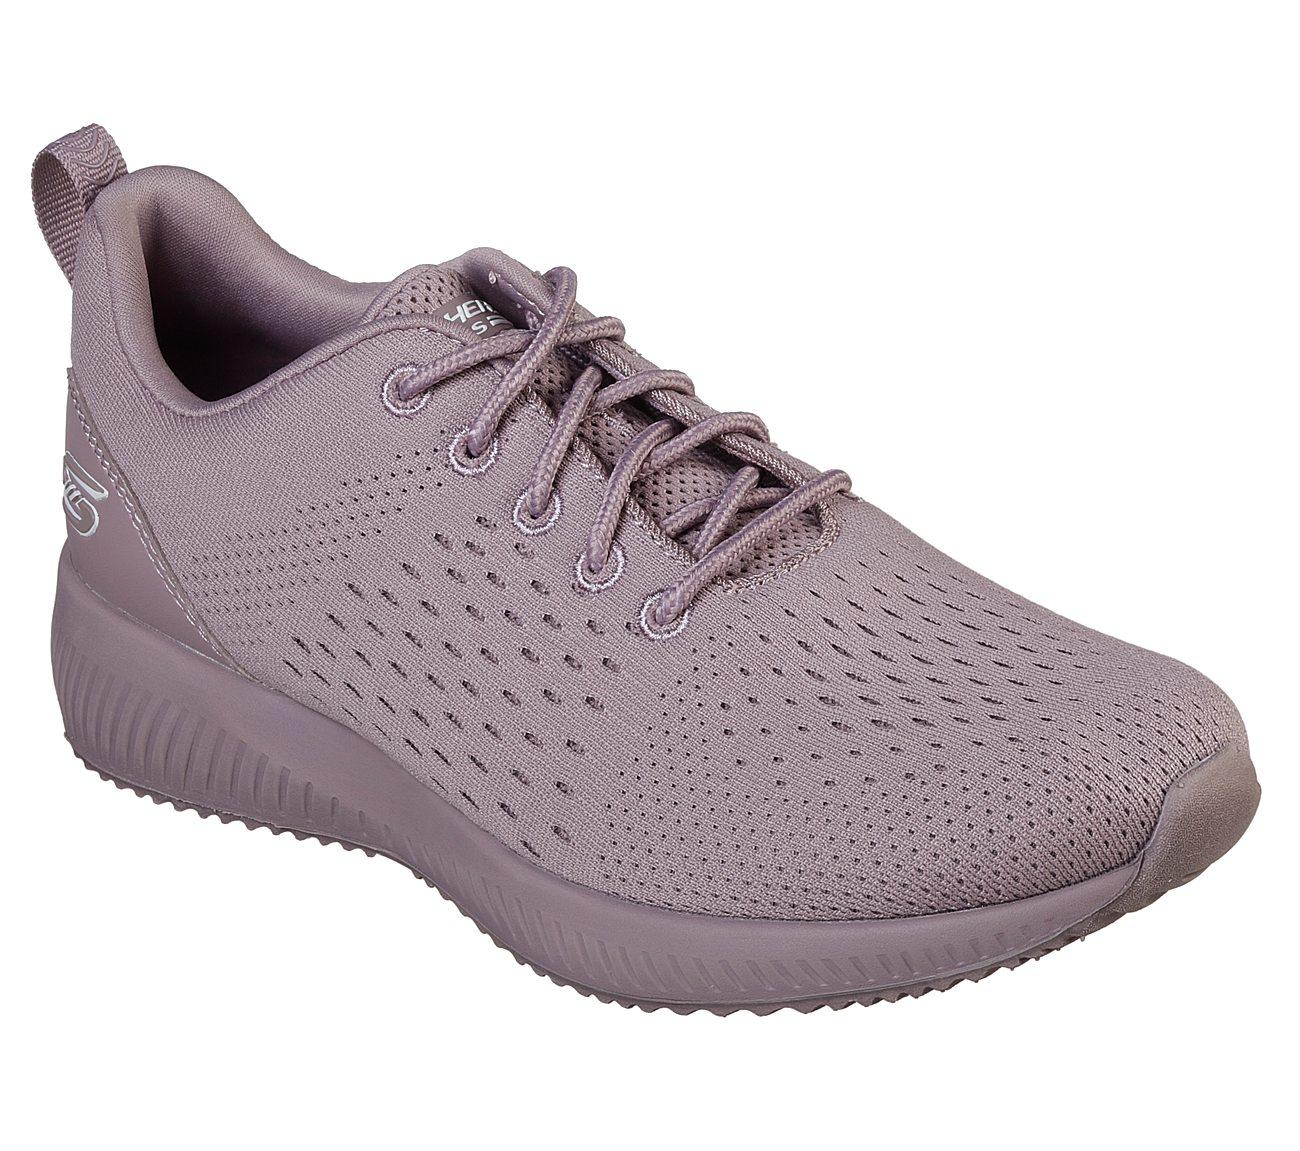 Skechers BOBS Sport Squad Ultraviolet Sneaker (Women's) RFVECz